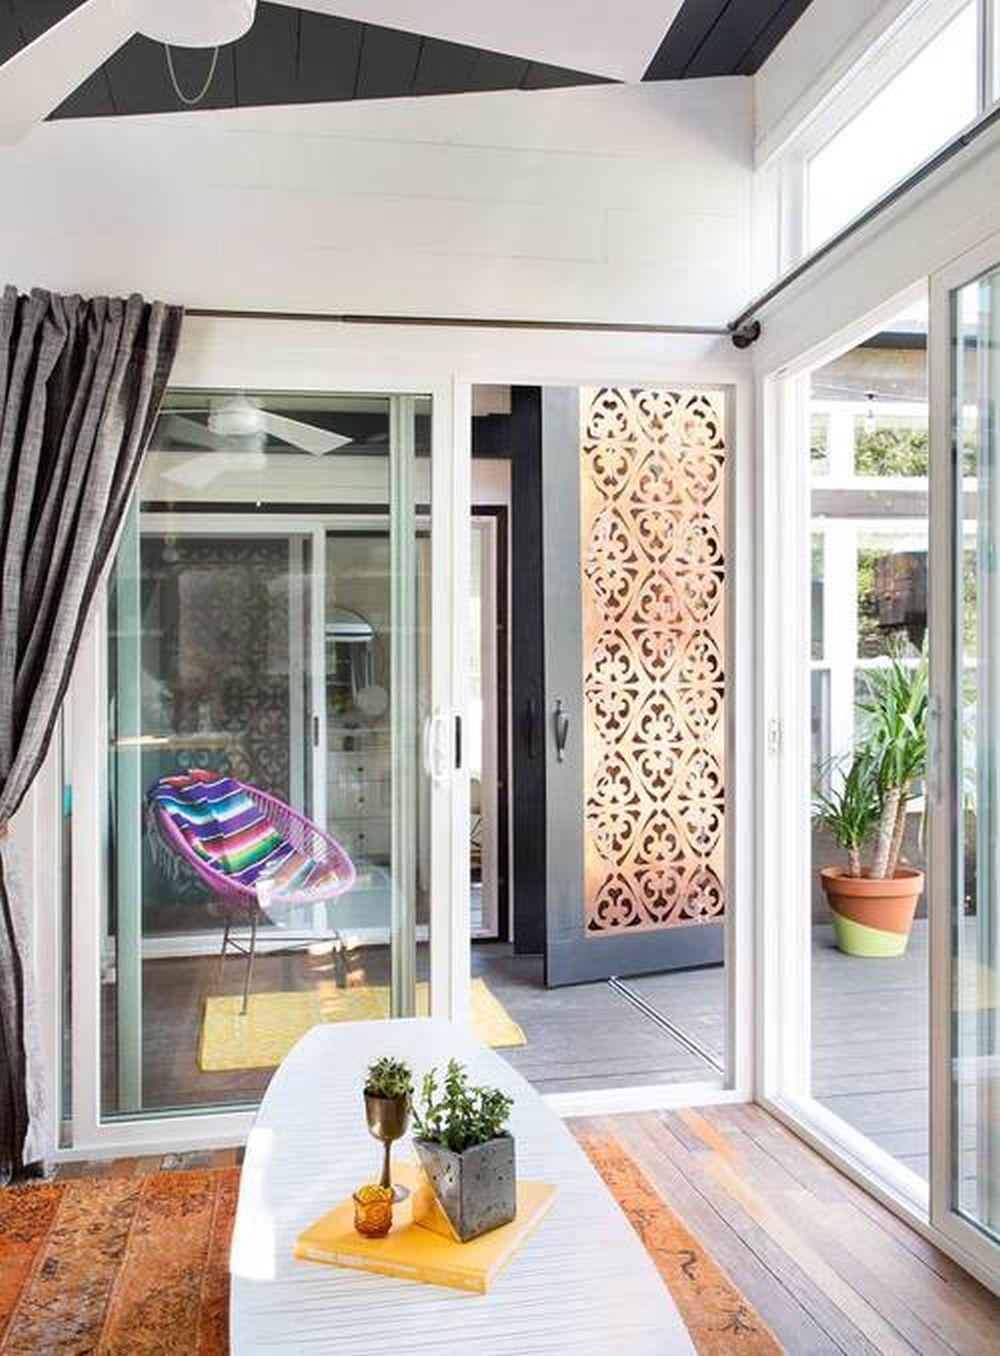 adelaparvu.com despre casa facuta din containere de camion, Designer Kim Lewis, Foto Molly Winters (3)